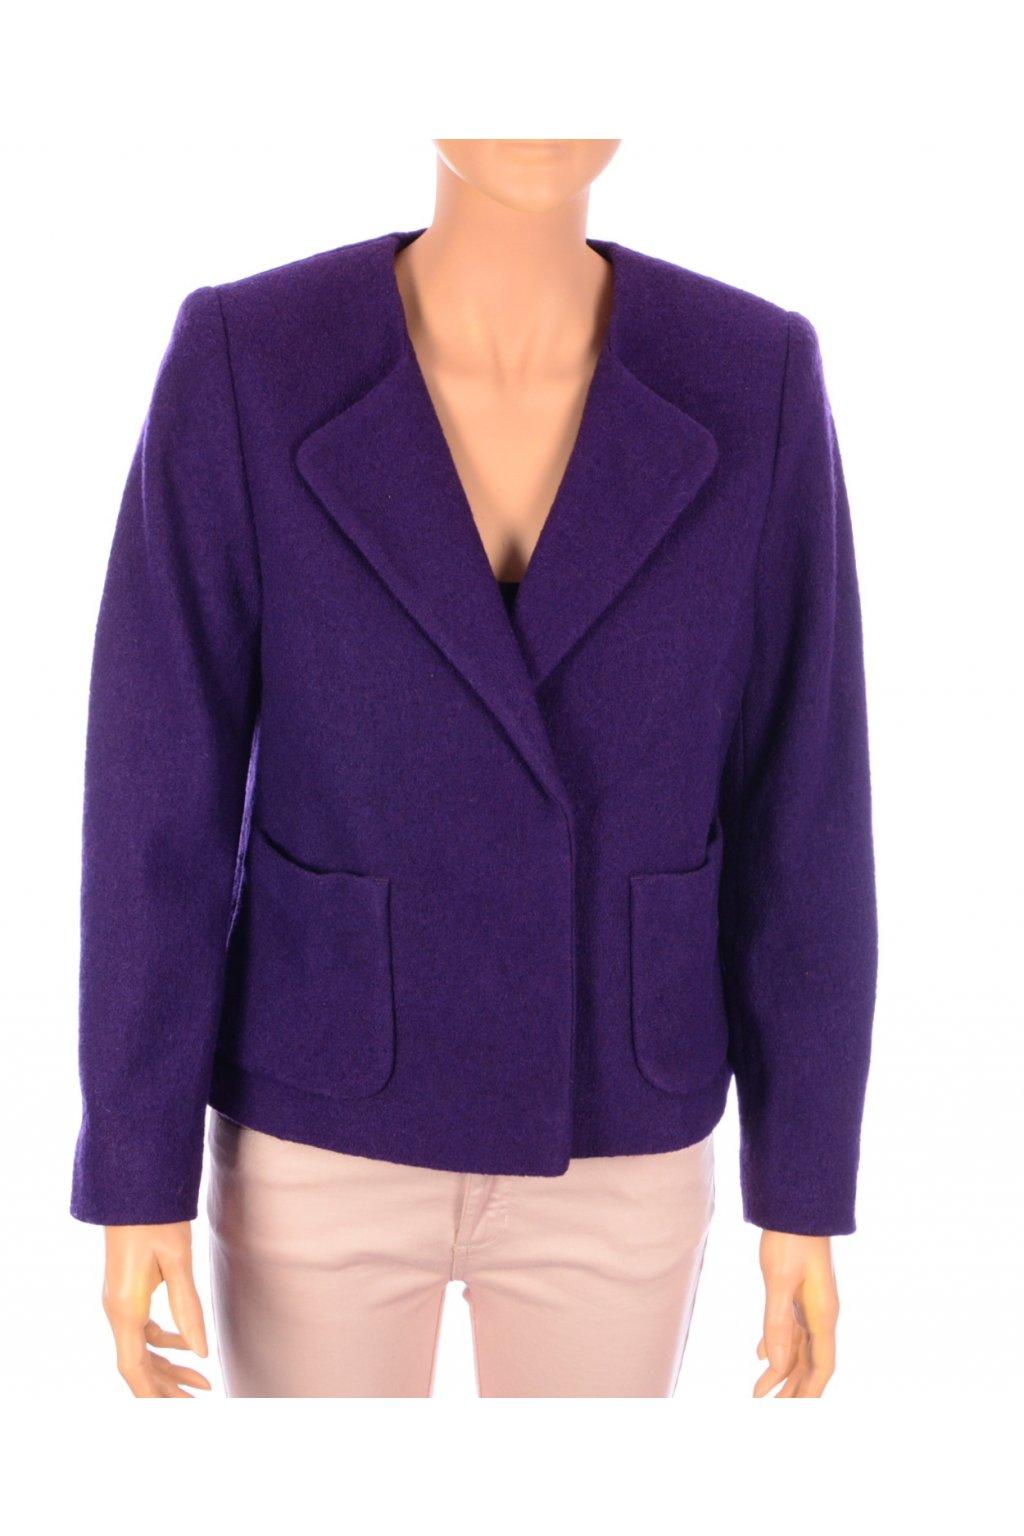 Kabát krátký Eastex vel.S fialový